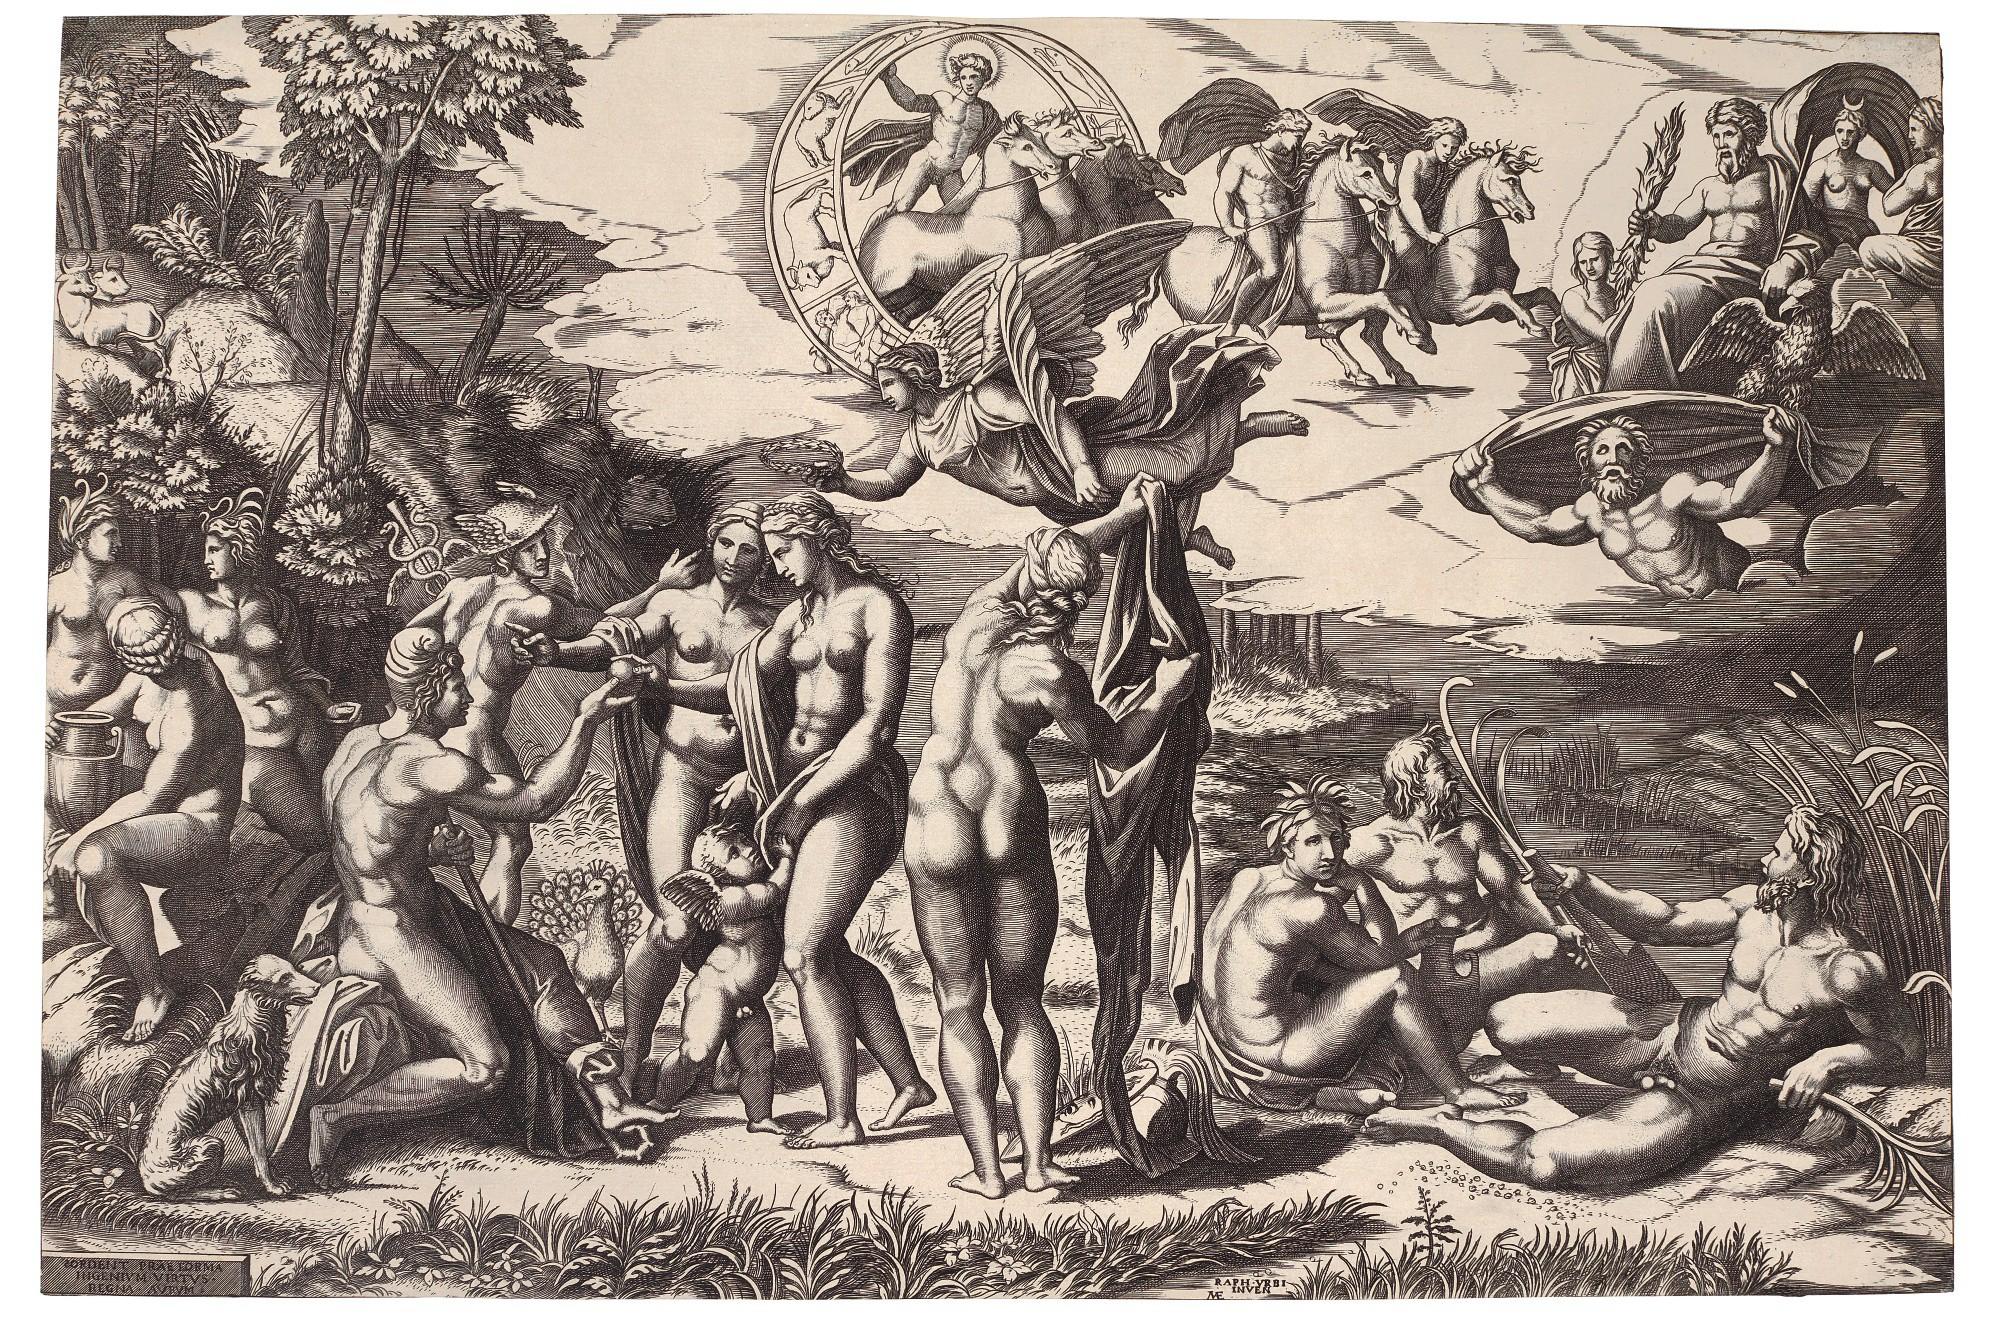 FOLLOWERS OF MARCANTONIO RAIMONDI | THE JUDGEMENT OF PARIS (AFTER MARCANTONIO RAIMONDI, AFTER RAPHAEL); AND THE BIRTH OF ADONIS (AFTER FRANCESCO SALVIATI) (BARTSCH XIX.246, XV.42.12)